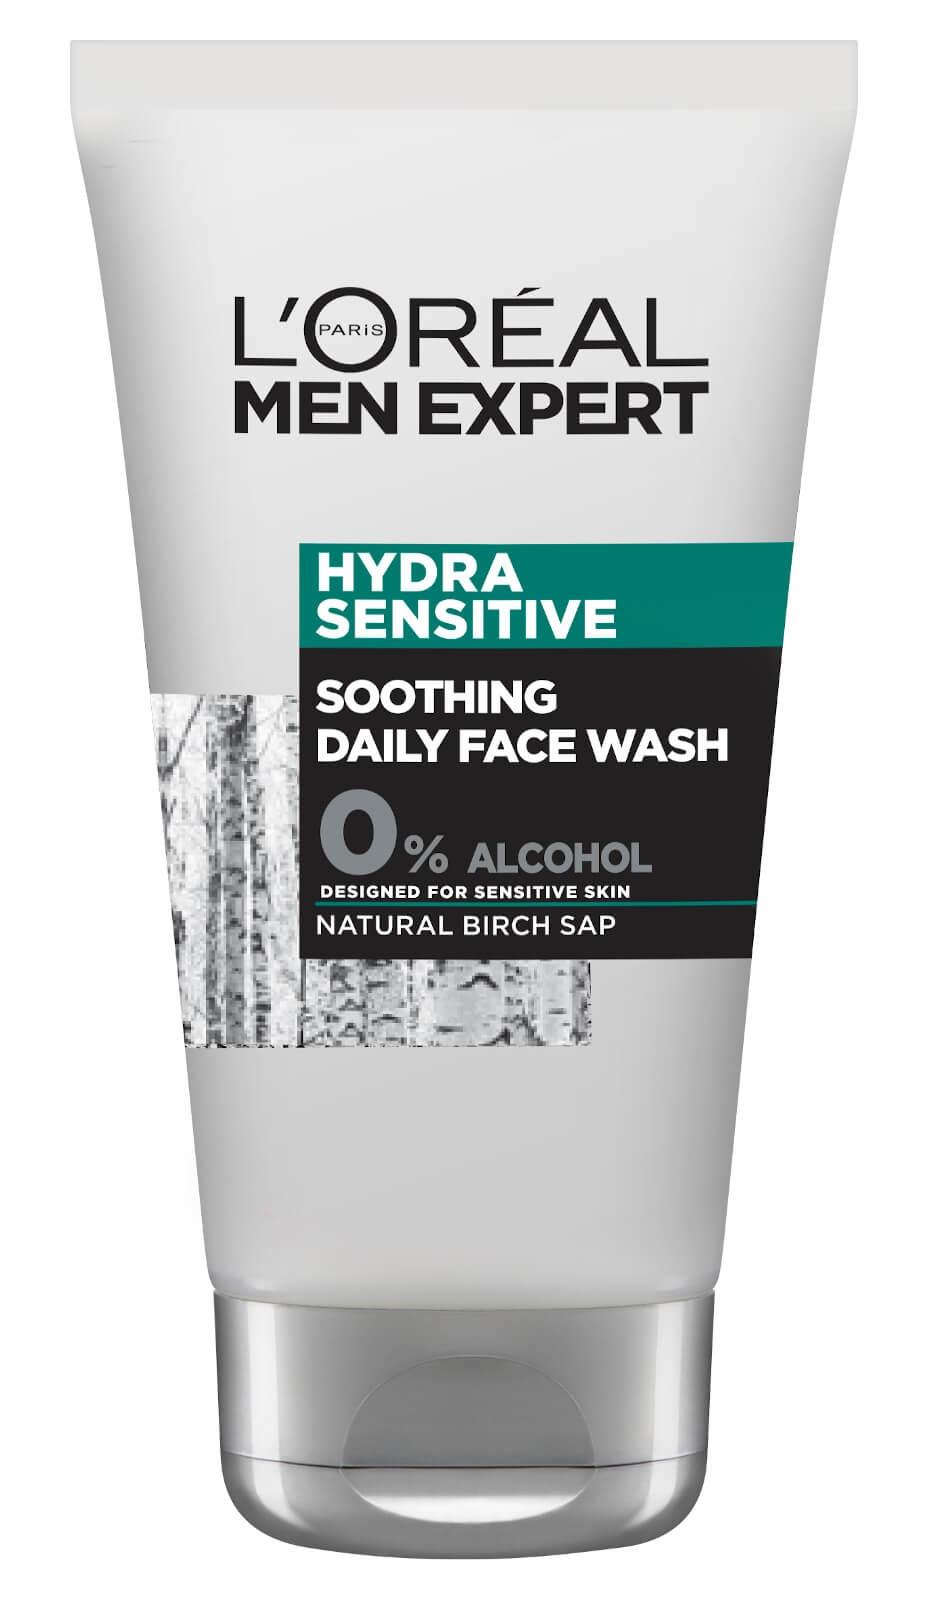 L'Oreal Men Expert Hydra Sensitive Skin Face Wash